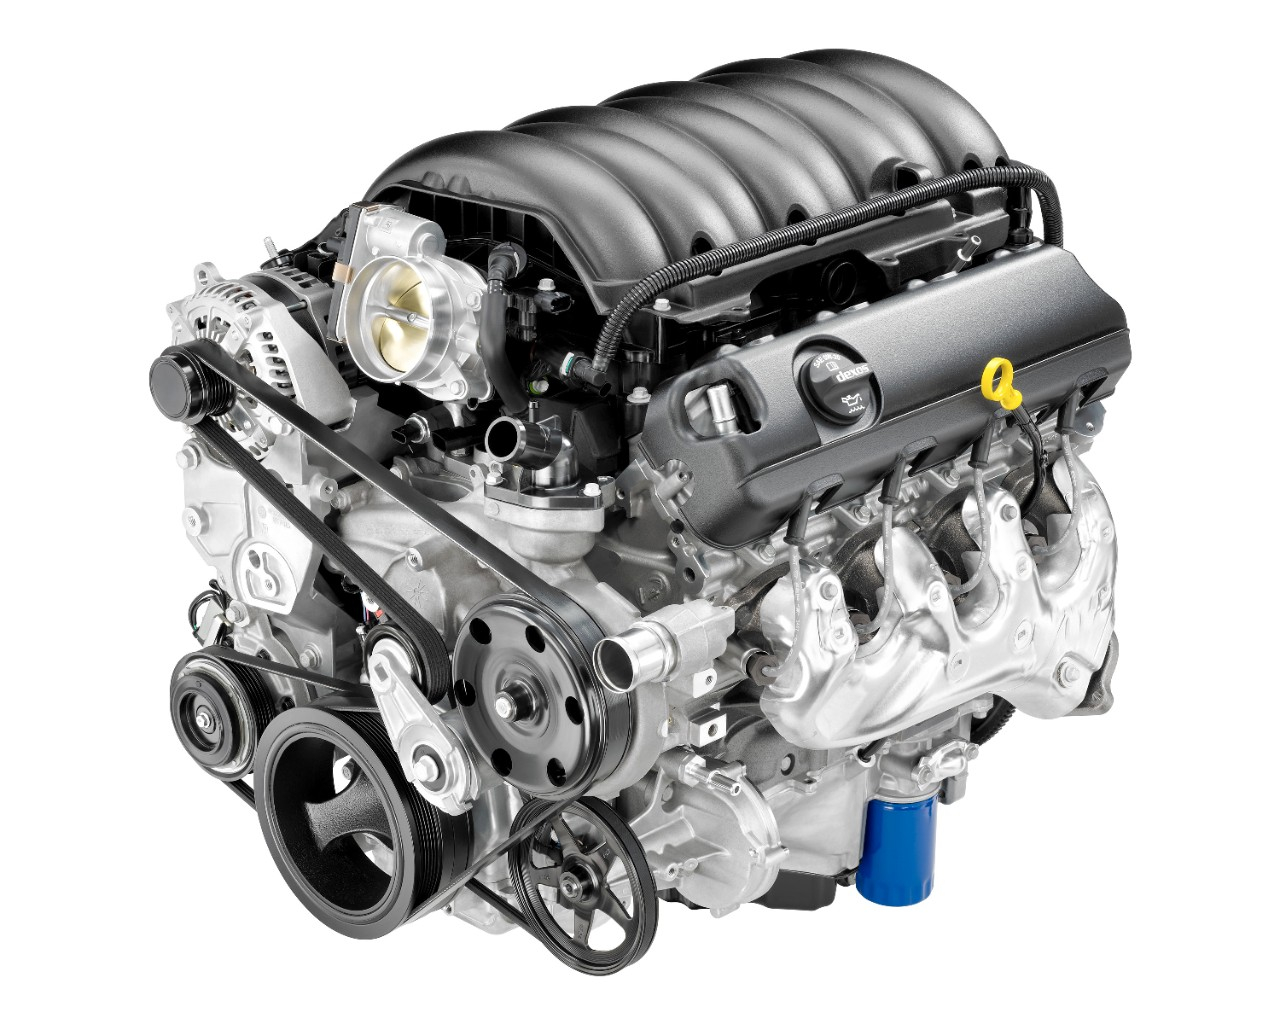 hight resolution of gm 6 2l v8 ecotec3 l86 engine 2